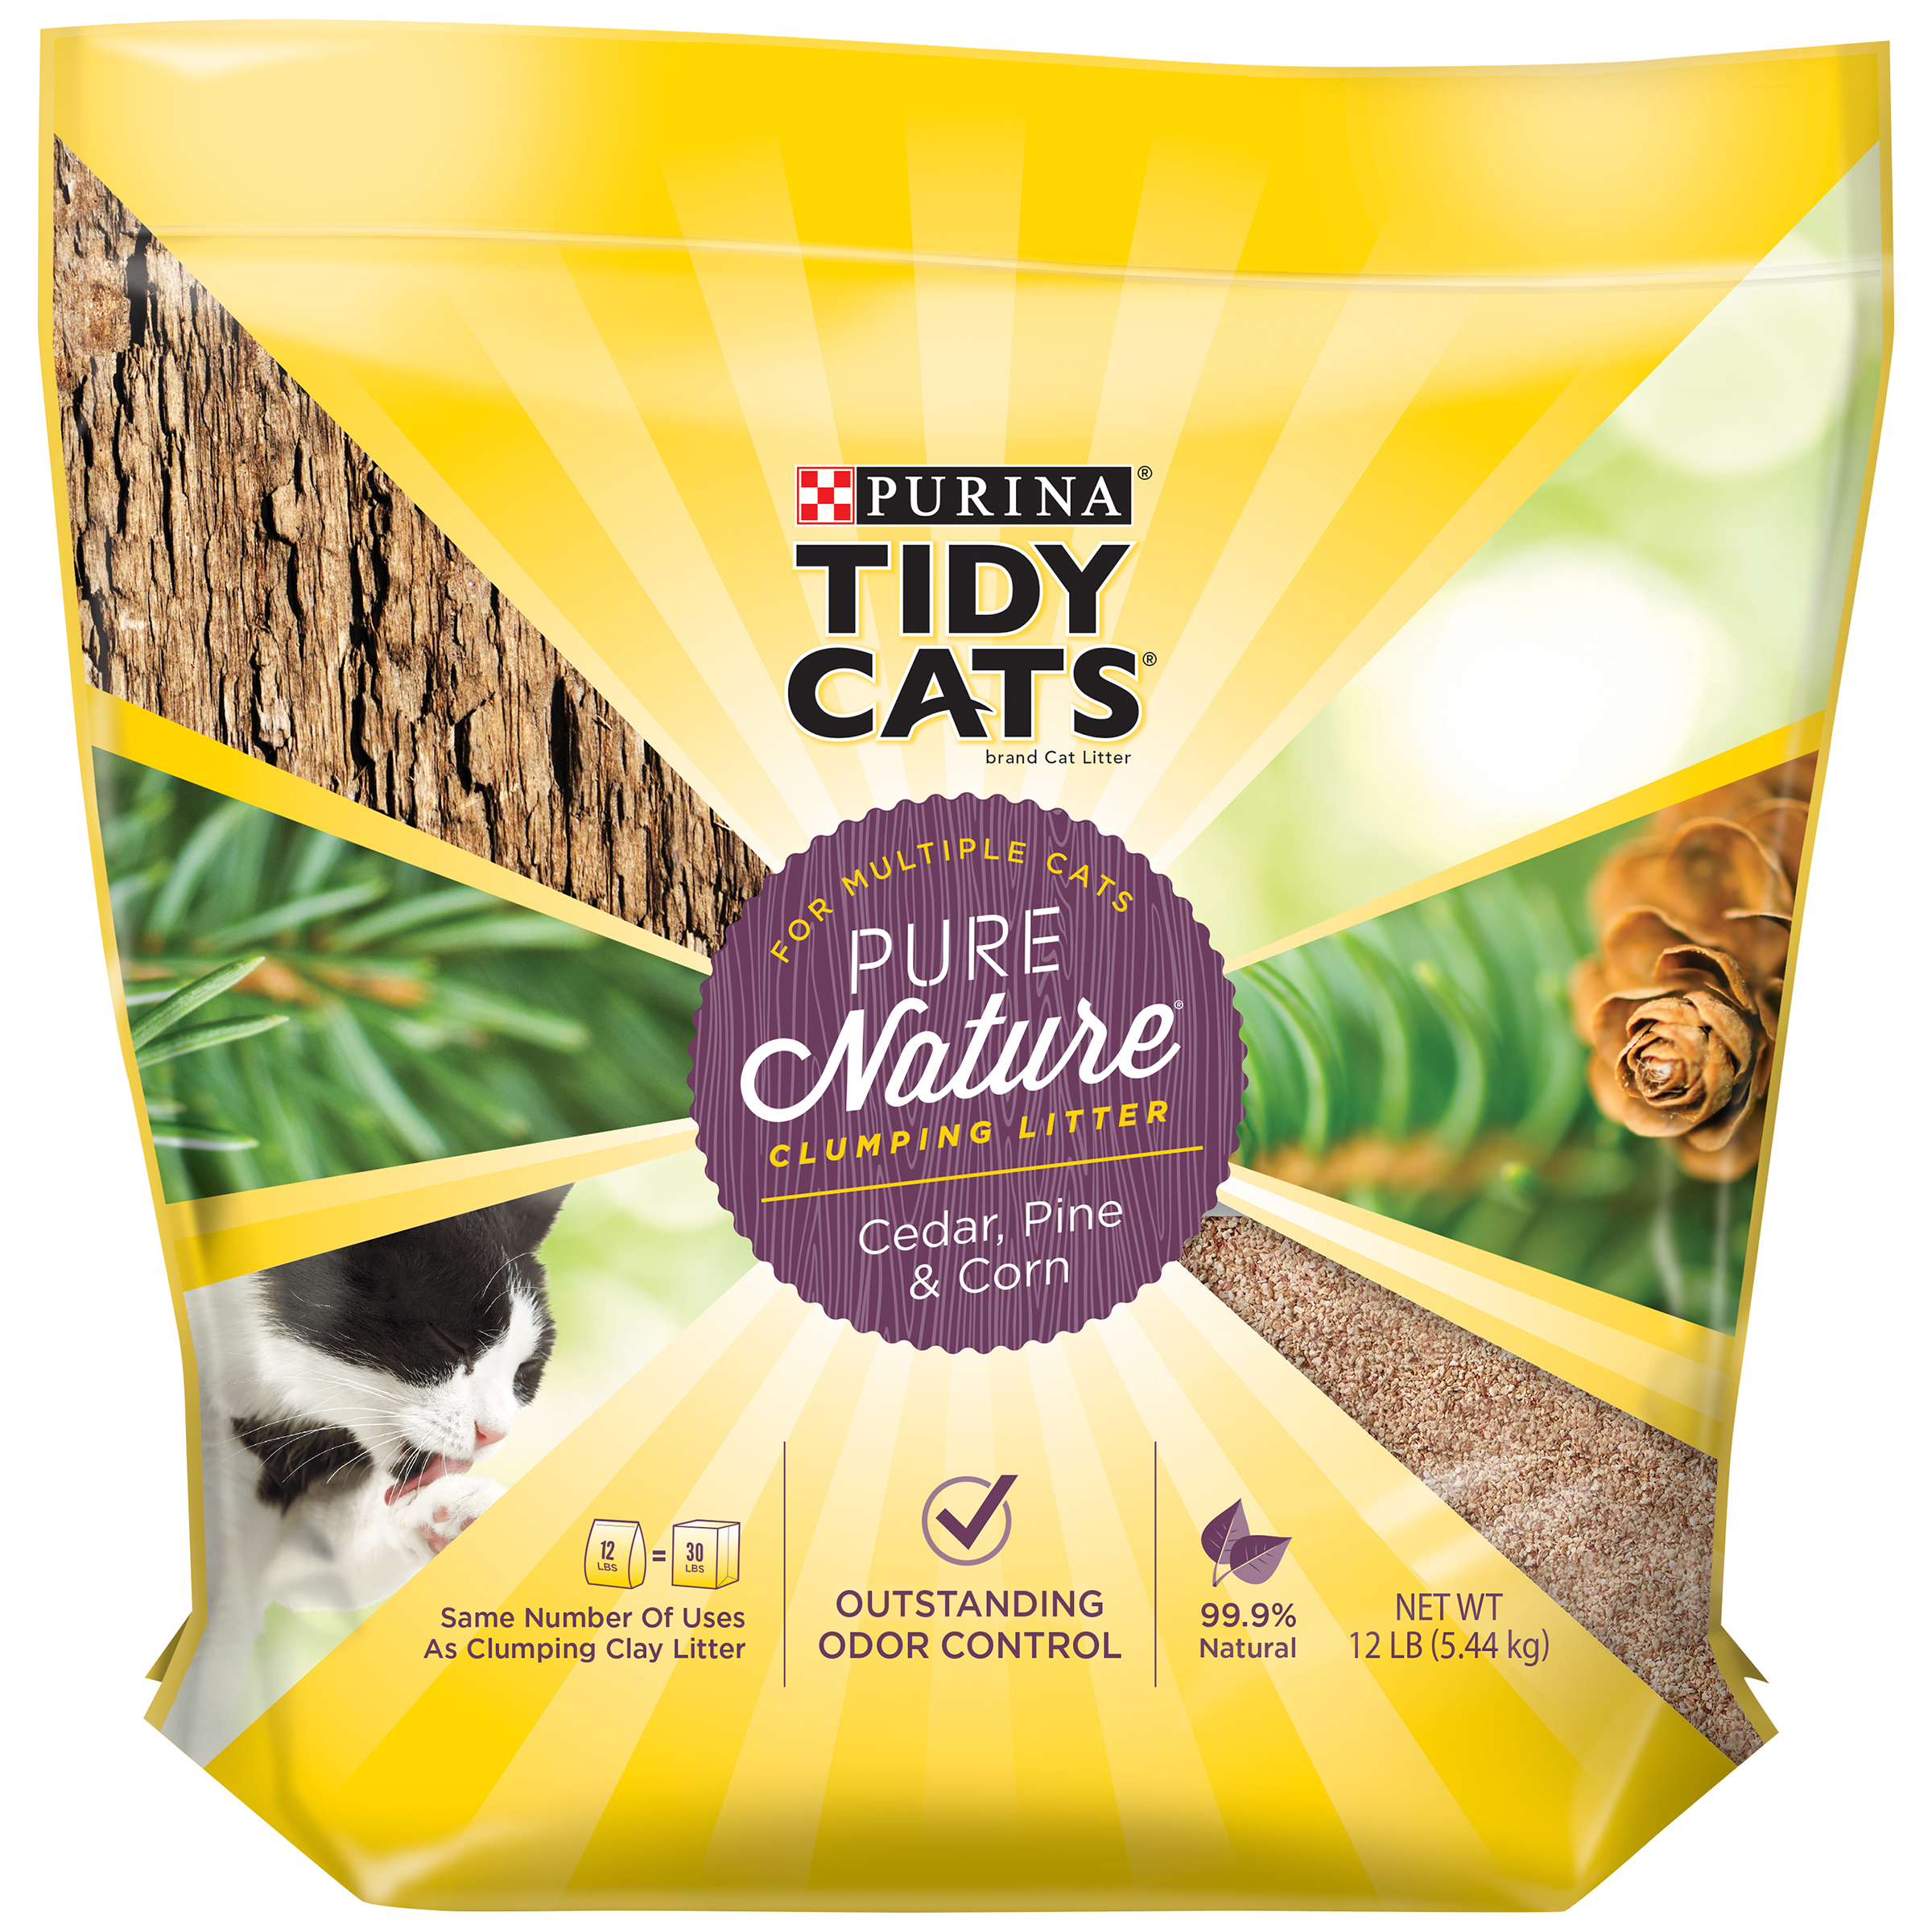 Purina Tidy Cats Pure Nature Cedar, Pine & Corn Clumping Litter for Multiple Cats 12 lb. Bag